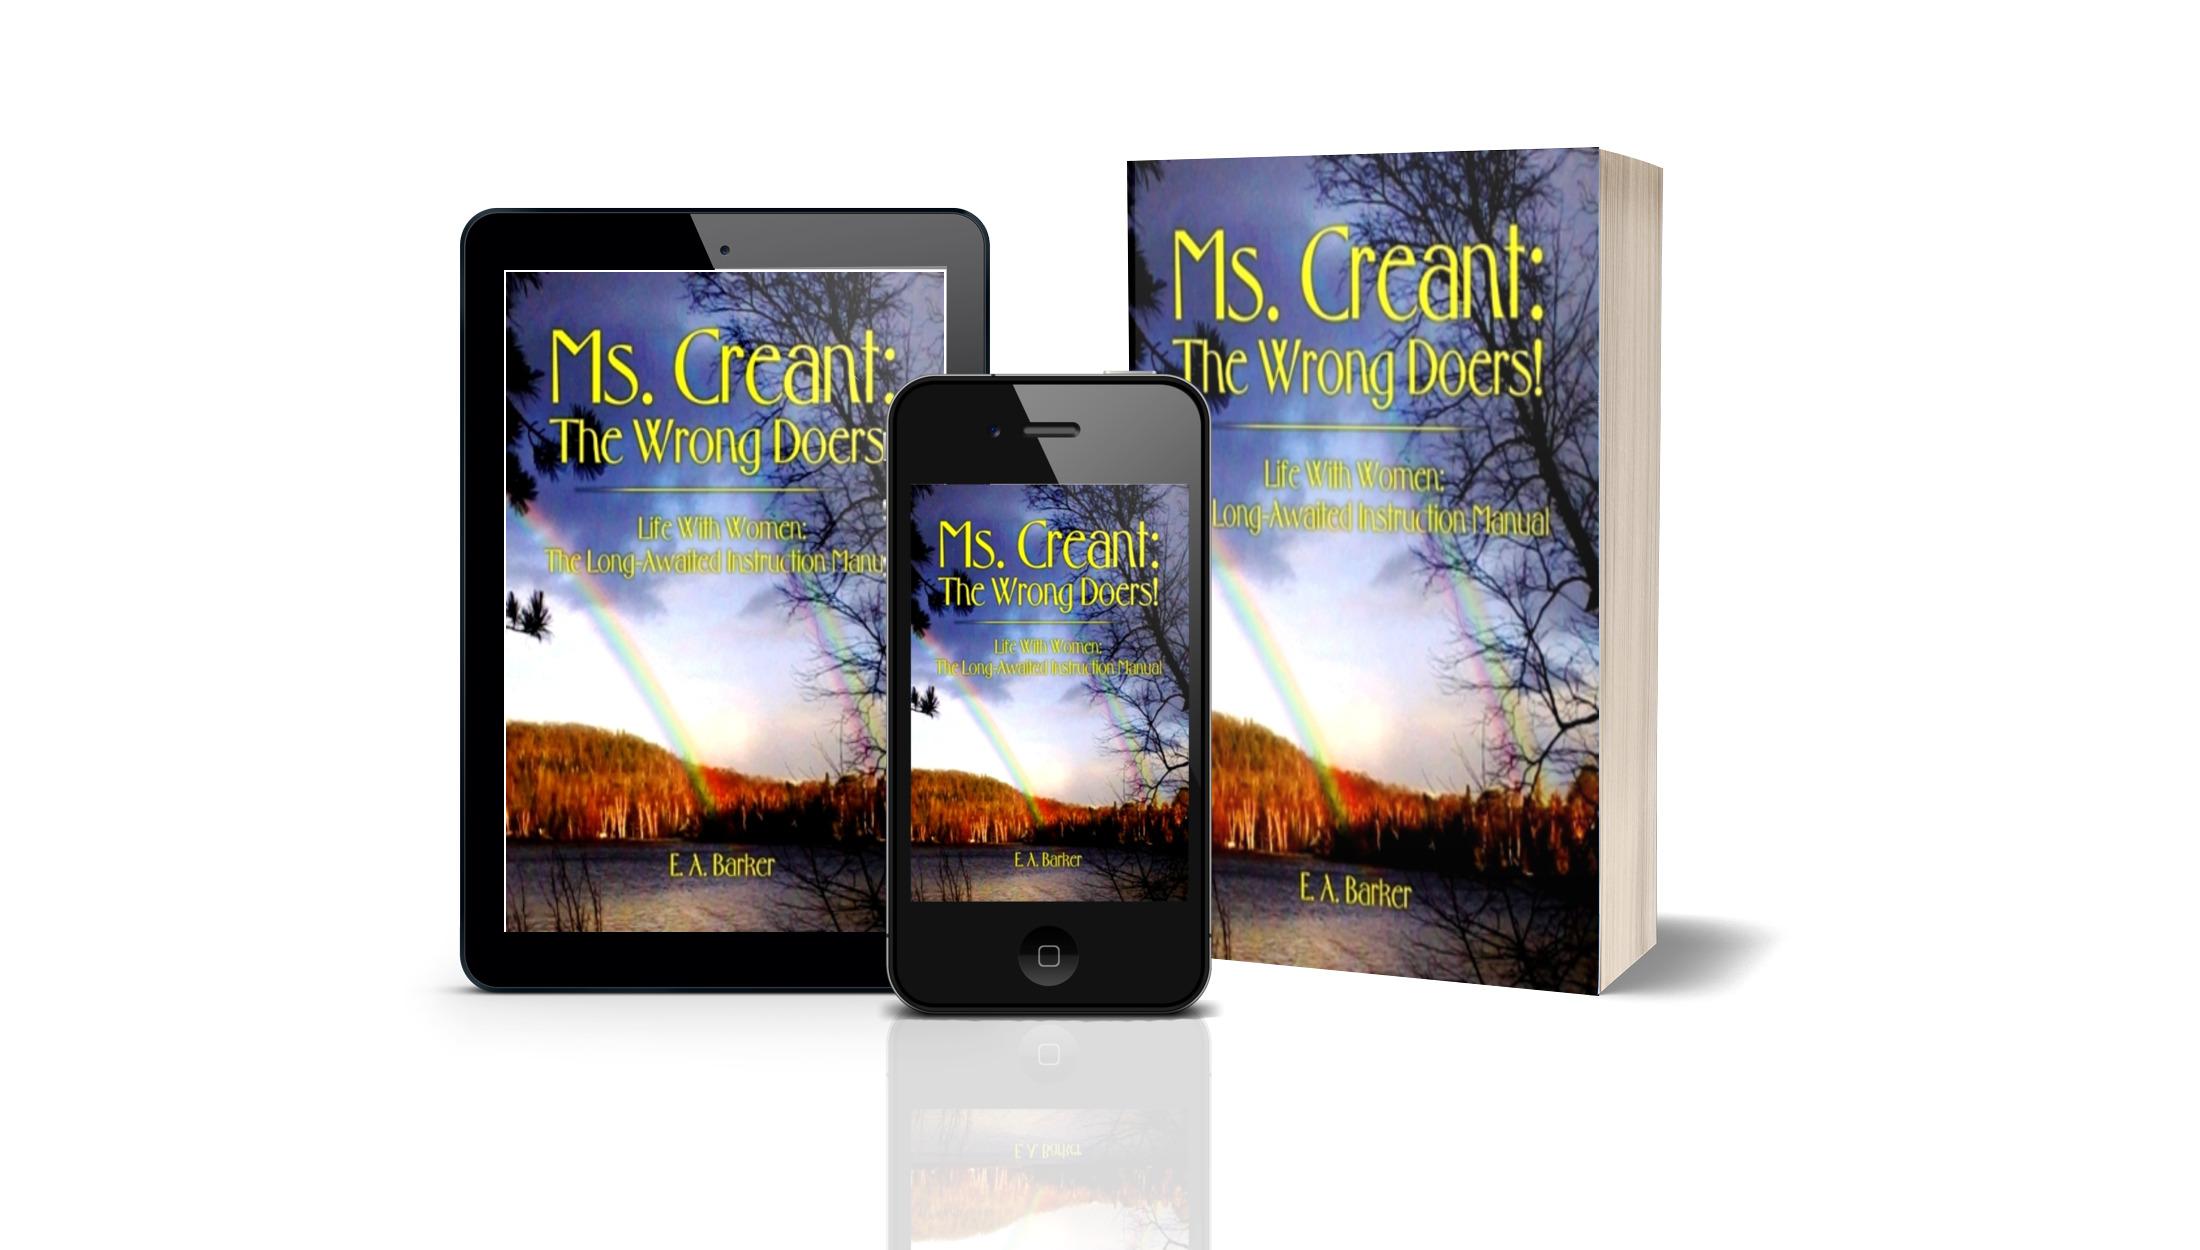 Ms. Creant: The Wrong Doers! e-book E. A. Barker Book Cover